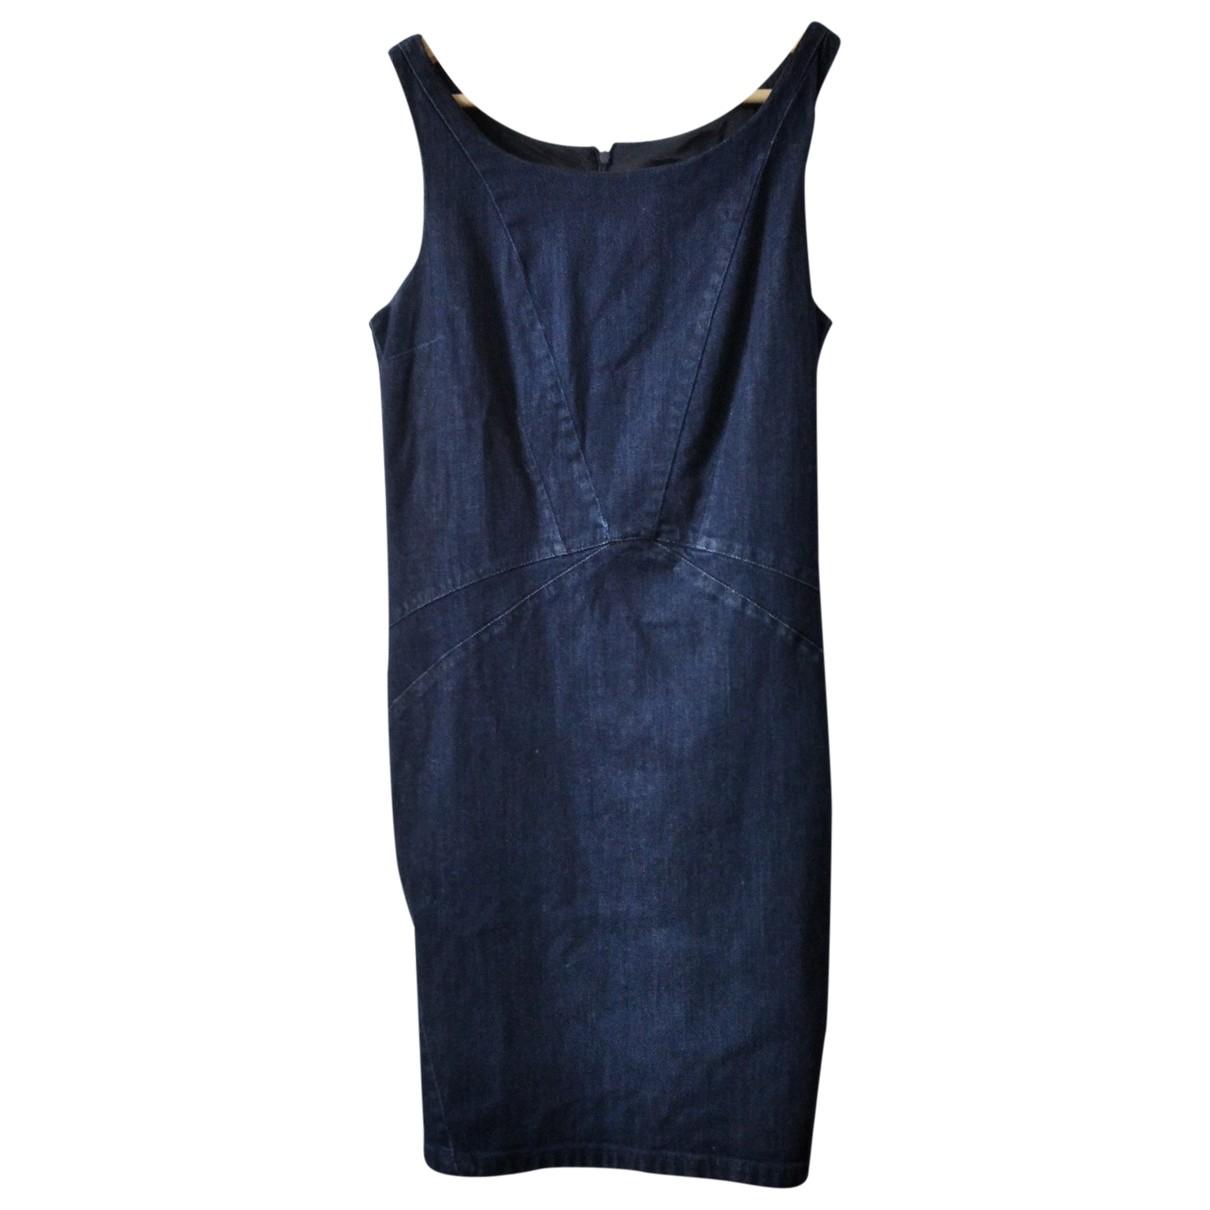 Armani Jeans \N Navy Cotton dress for Women 46 FR